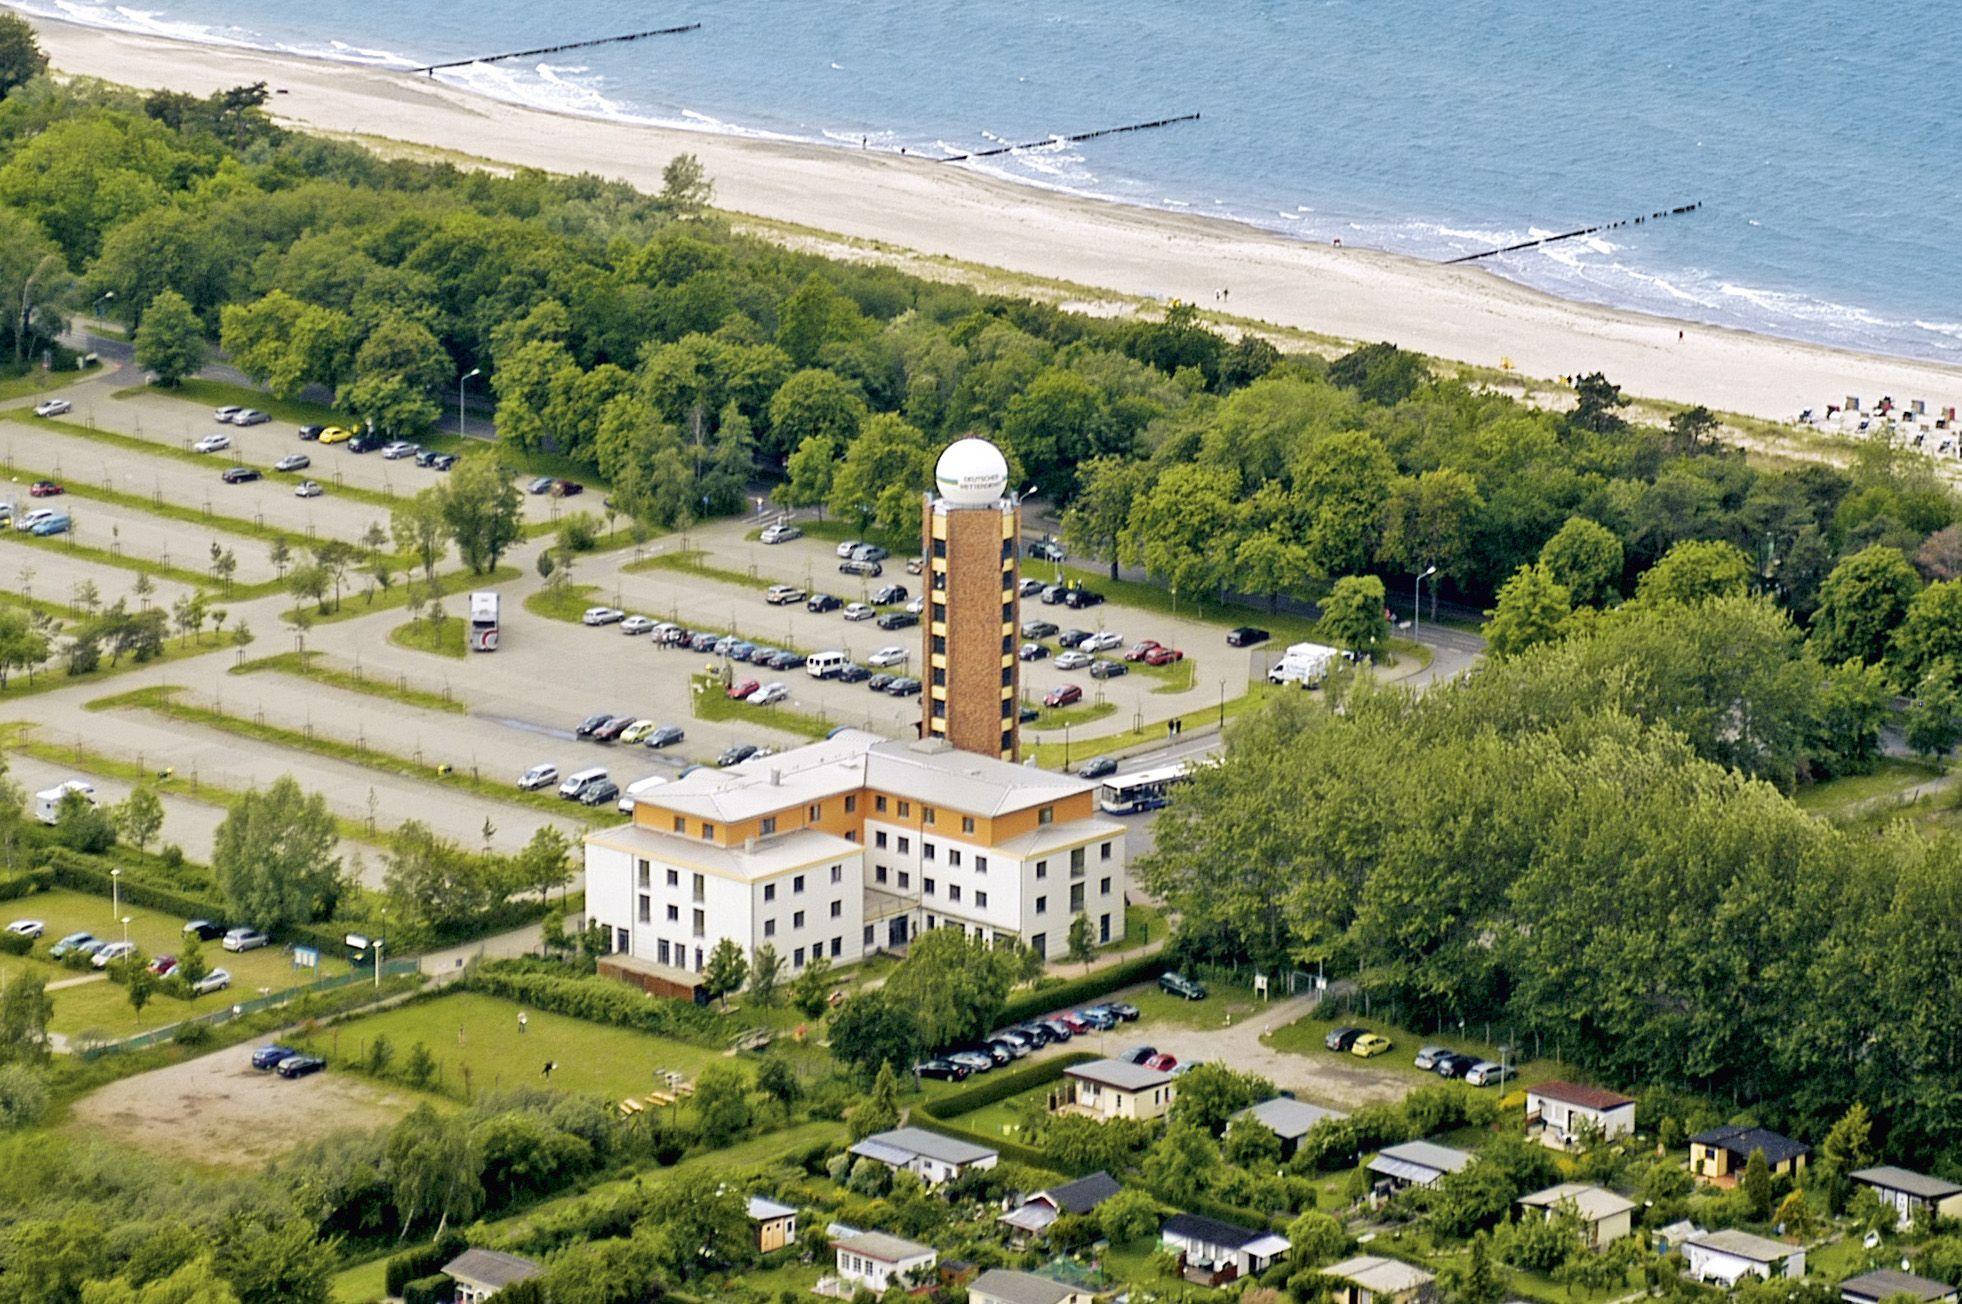 Jugendherberge In Rostock